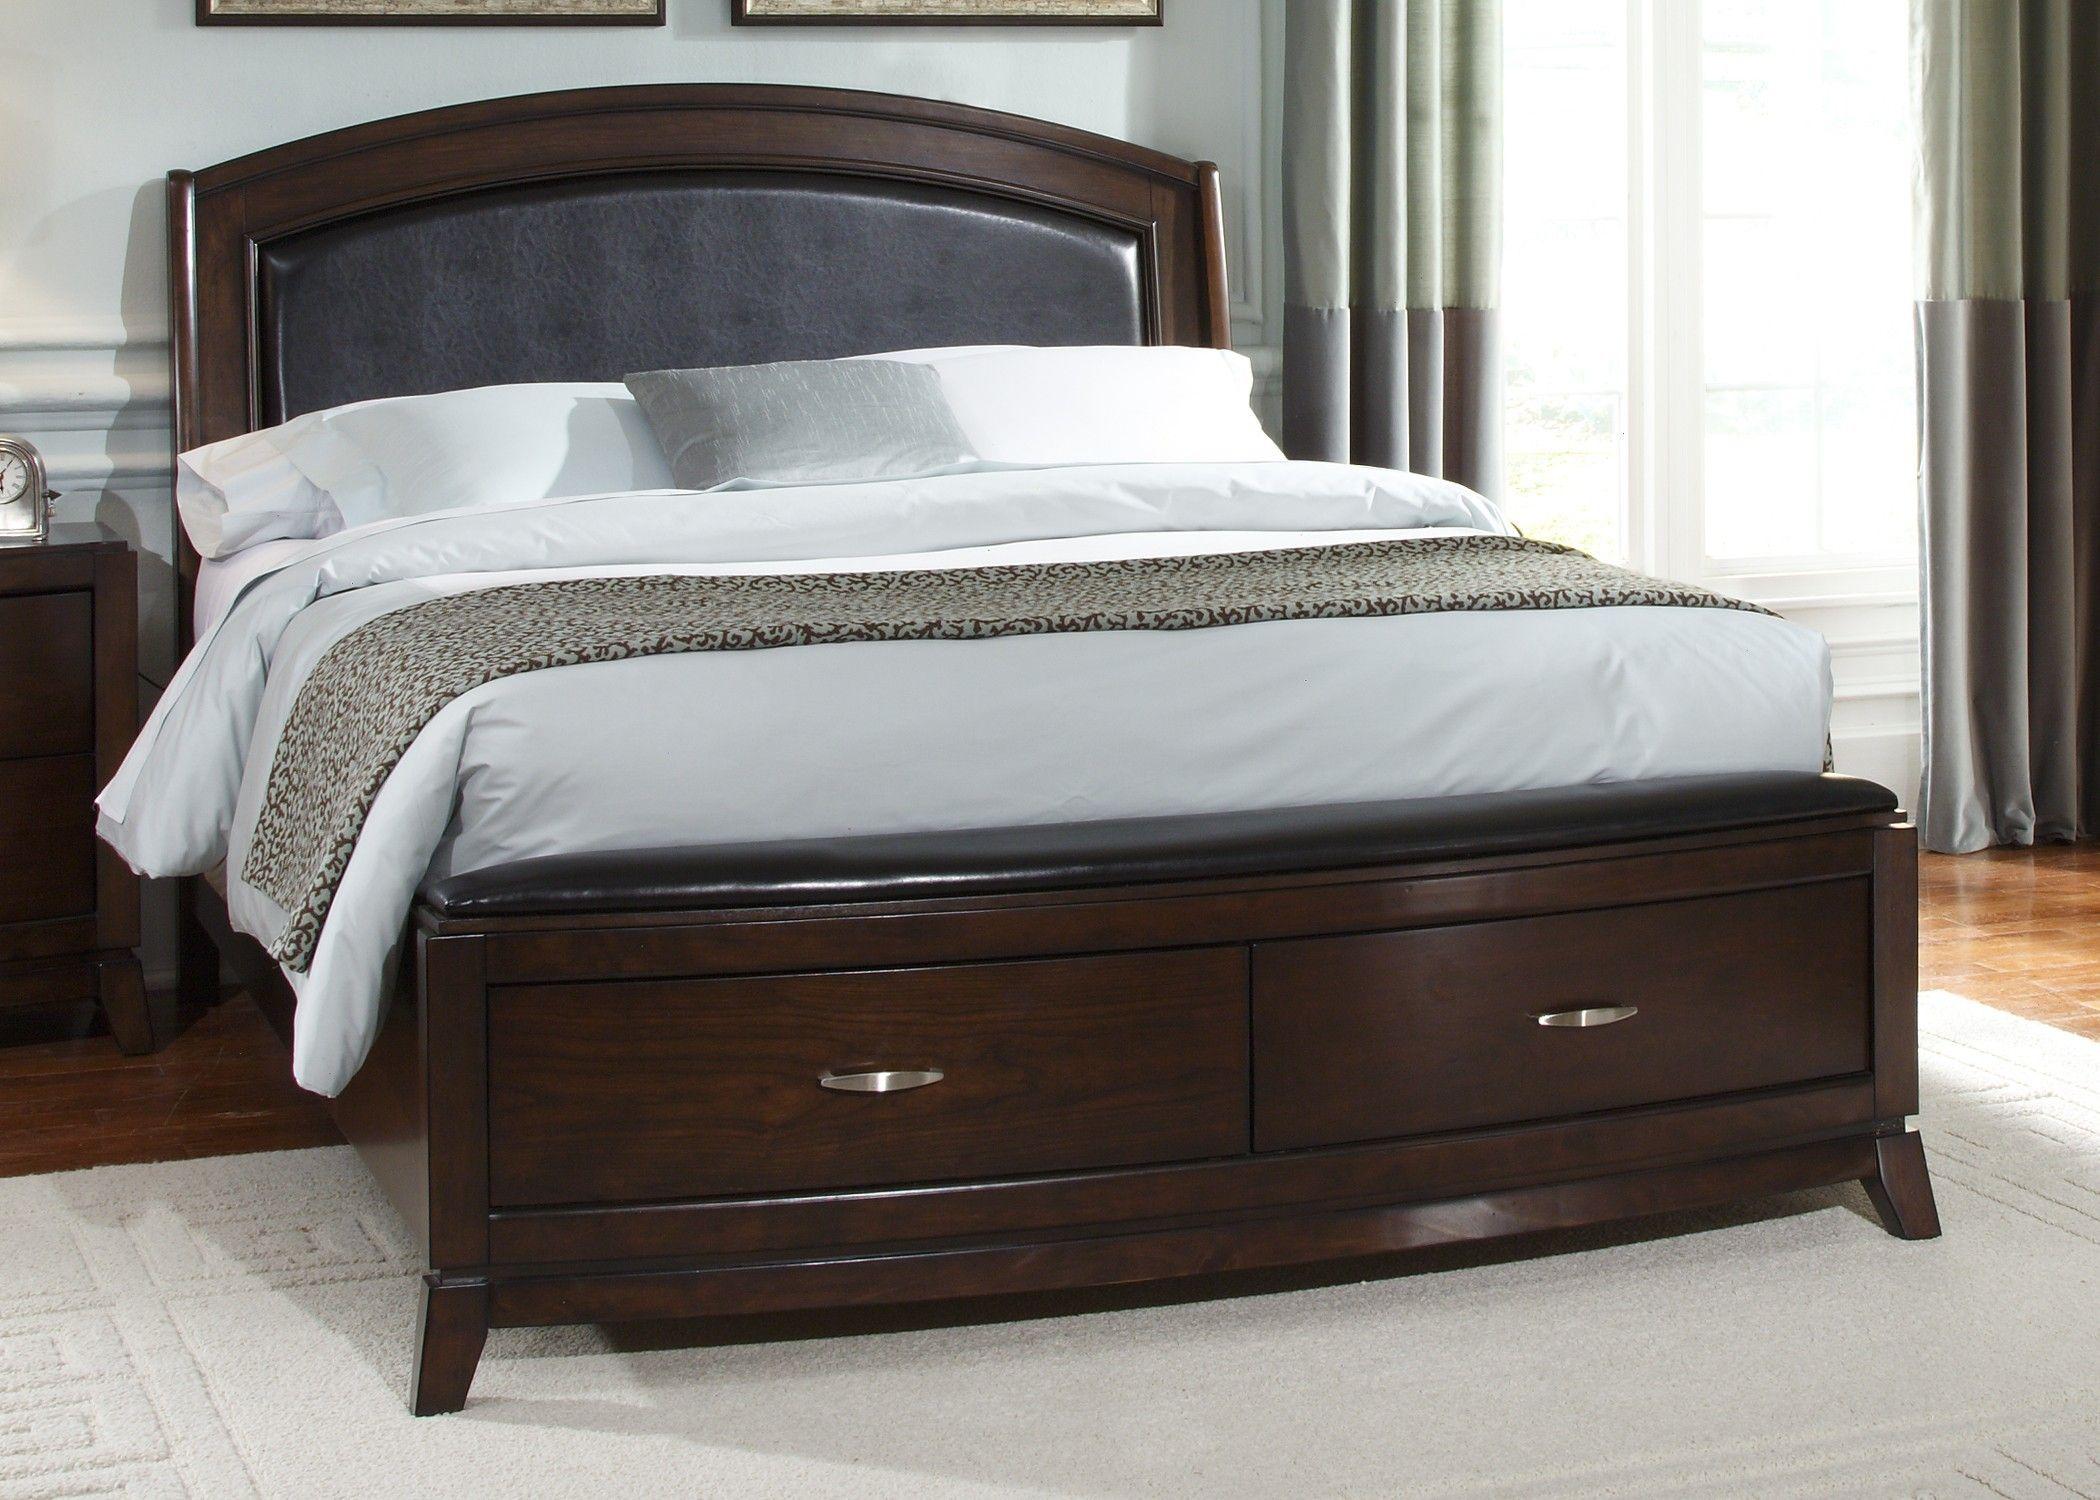 best 25 wood bed frame queen ideas on pinterest diy queen bed frame rustic bed frames and queen bed plans